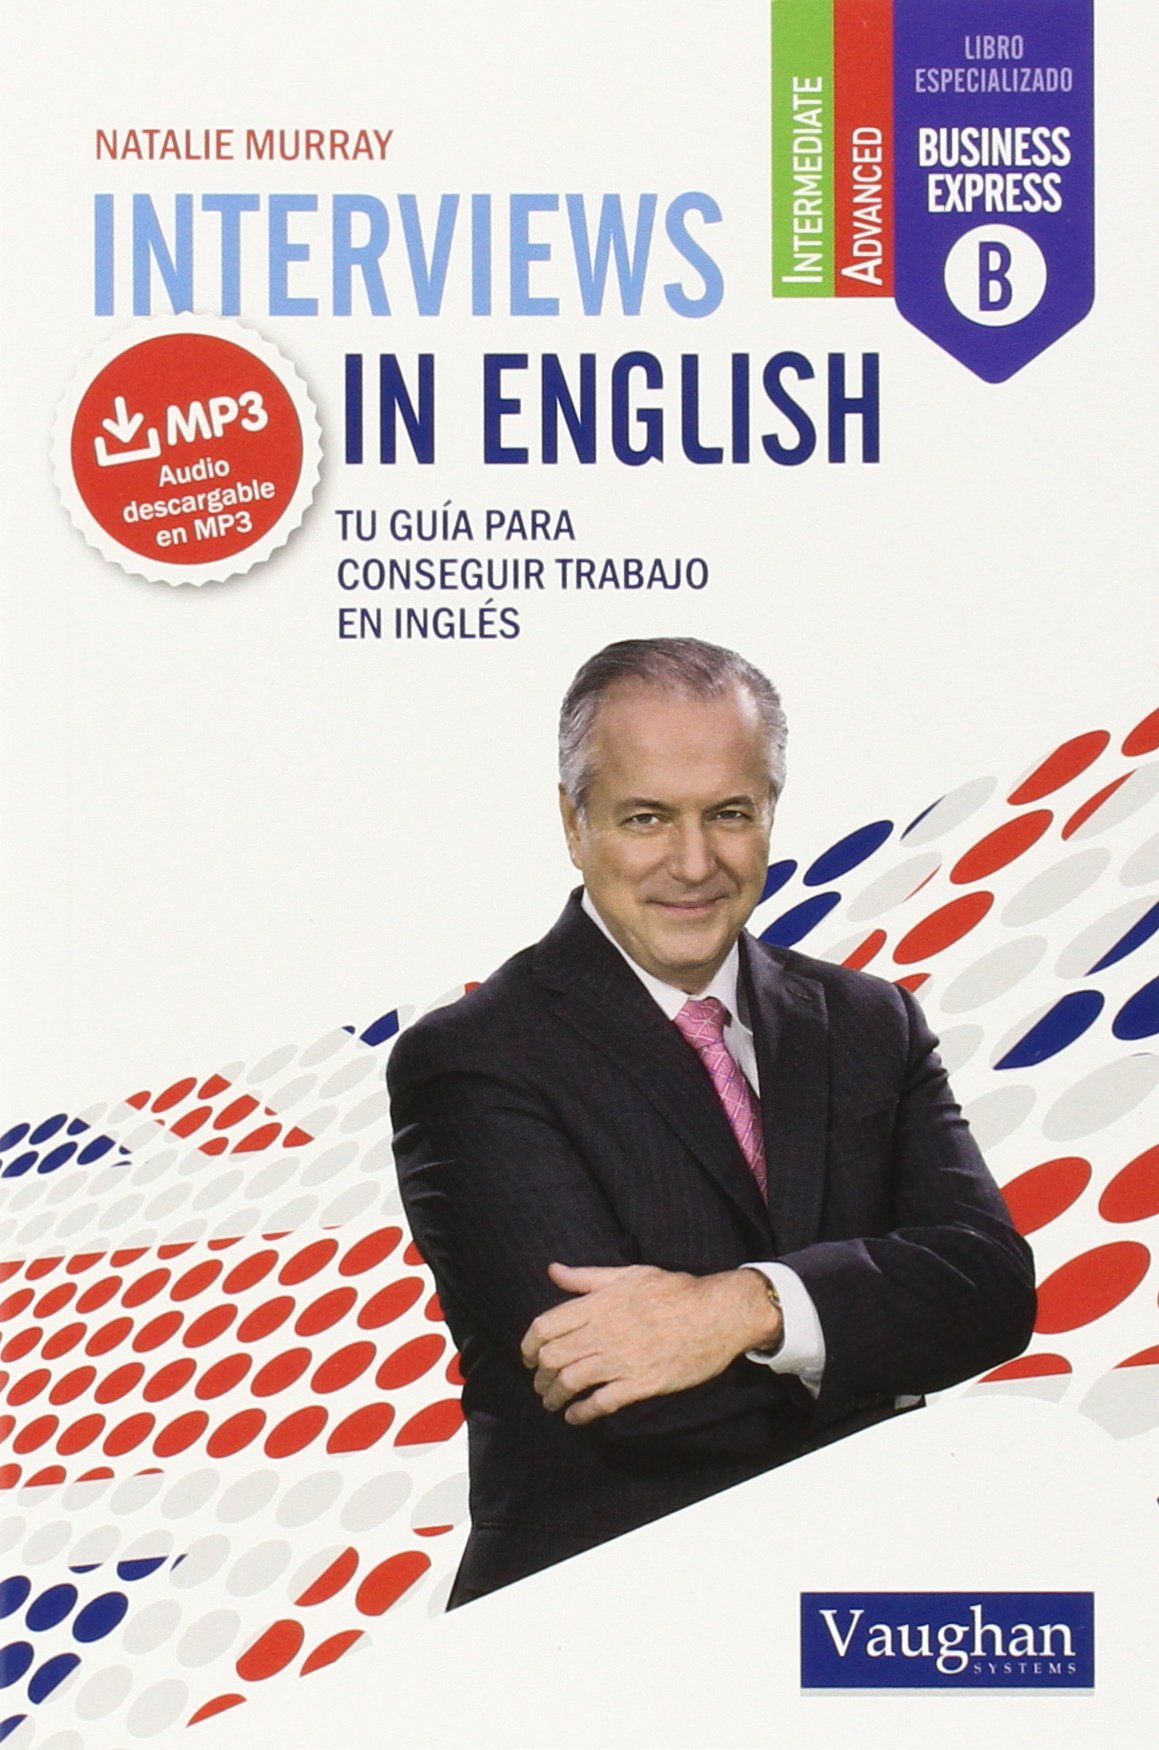 INTERVIEWS IN ENGLISH: TU GUÍA PARA CONSEGUIR TRABAJO EN INGLÉS (Inglés) Tapa blanda – 27 ene 2015 NATALIE MURRAY VAUGHAN 841609439X Englisch